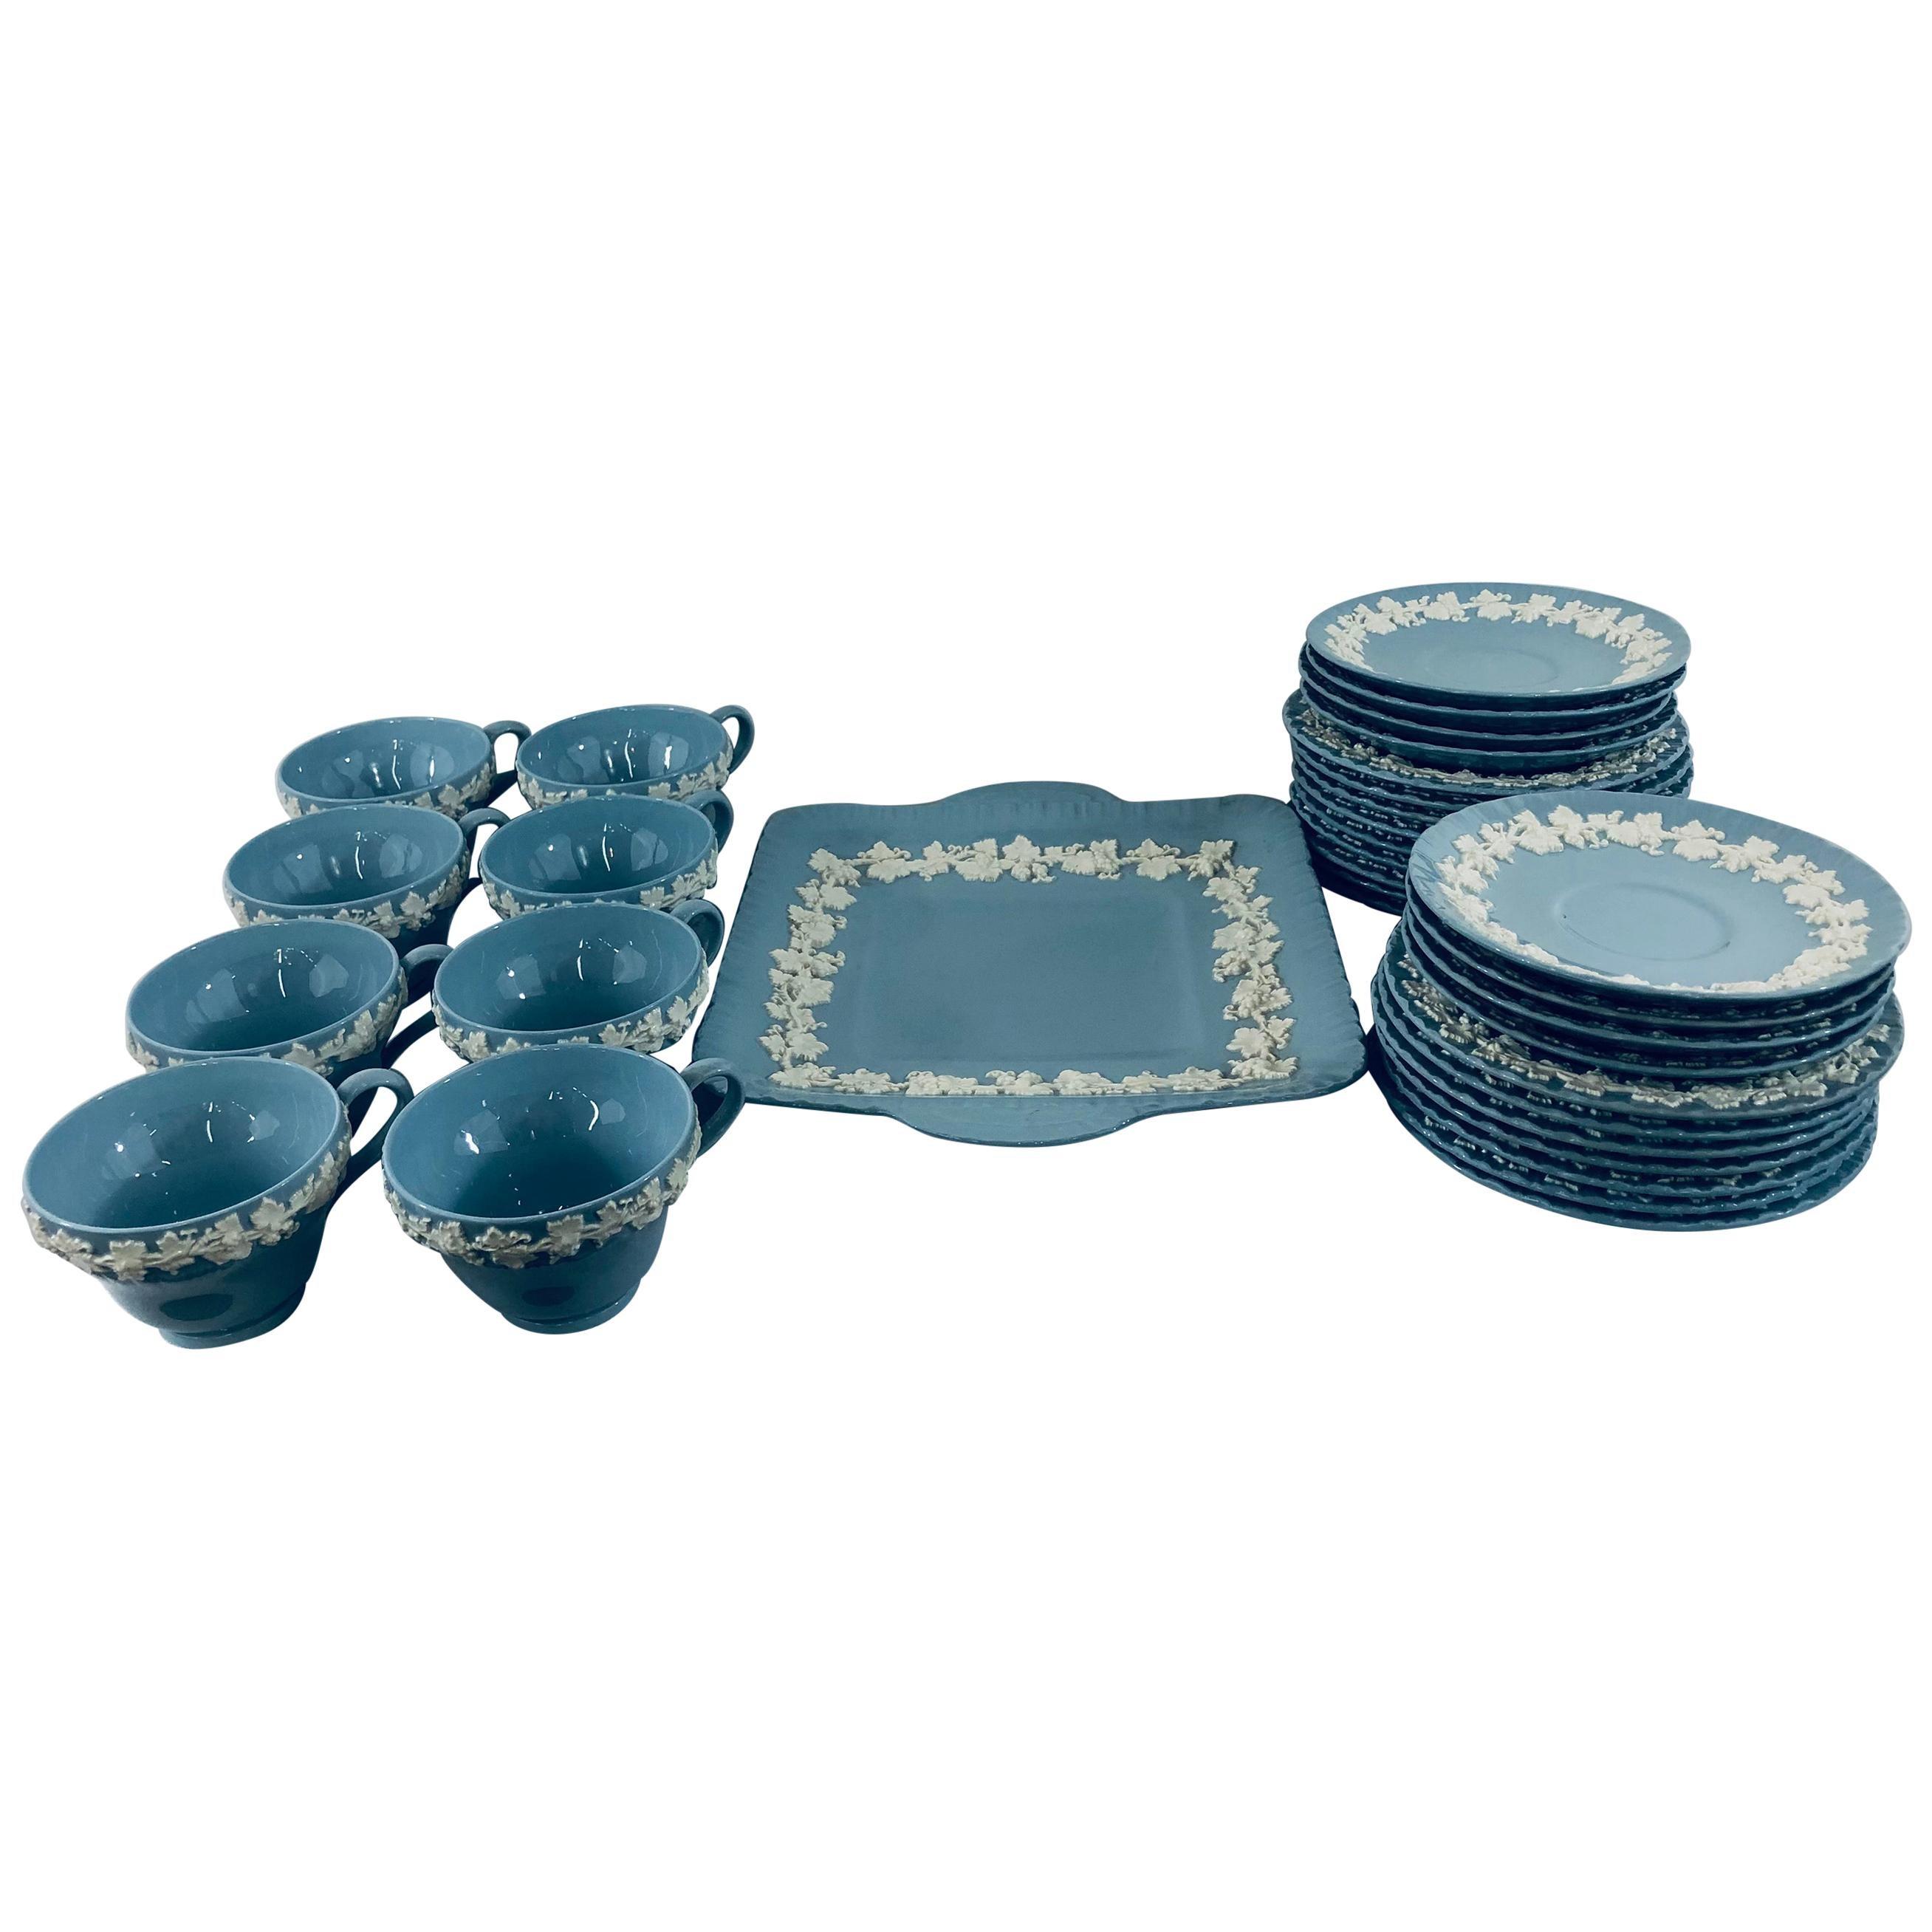 English Wedgwood Jasperware Servingware, Set of 33 Pieces